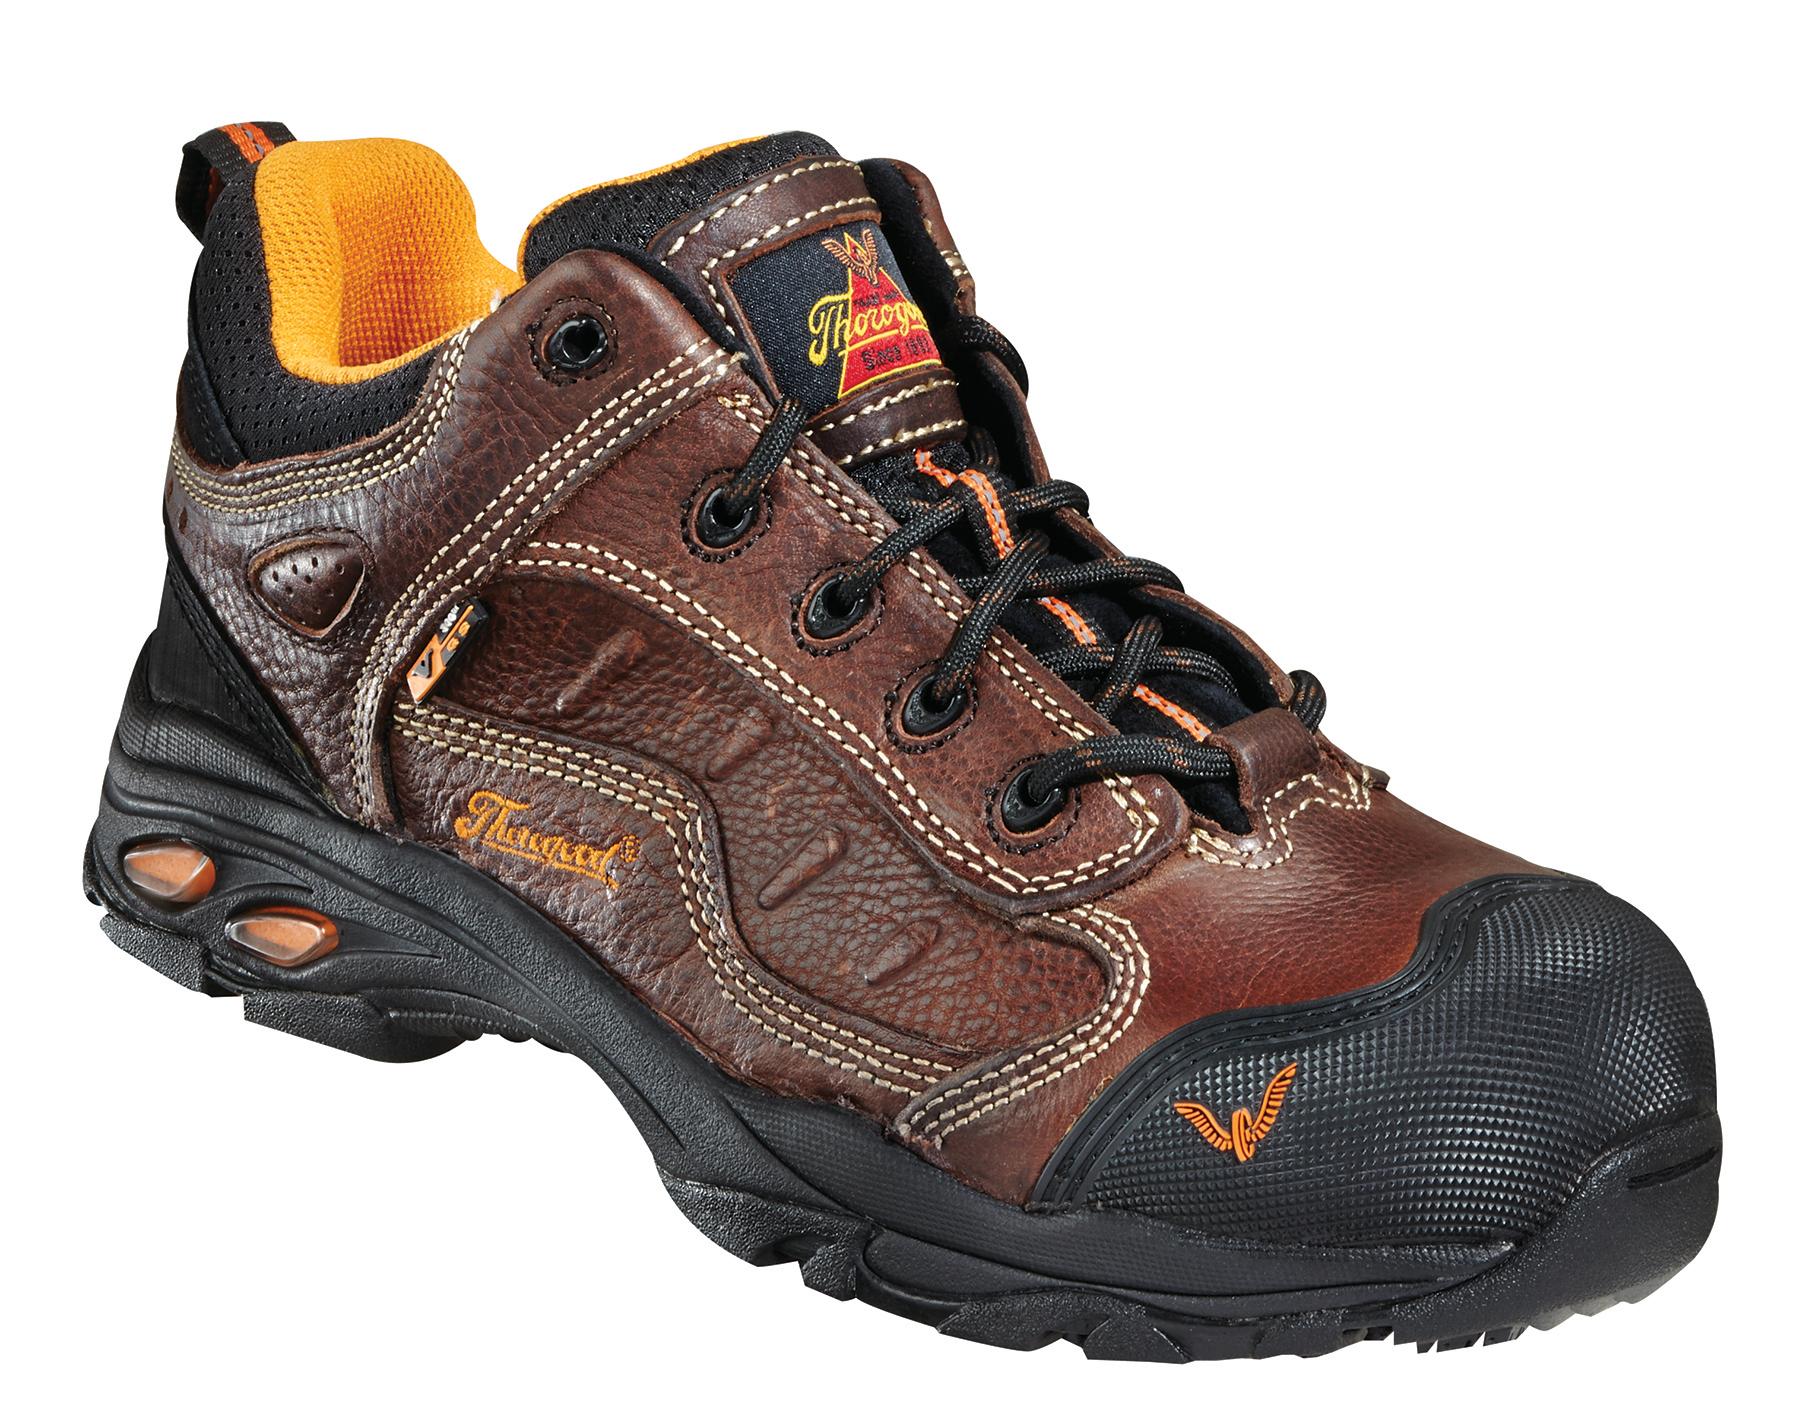 Men S Thorogood Composite Toe Boots 804 4035